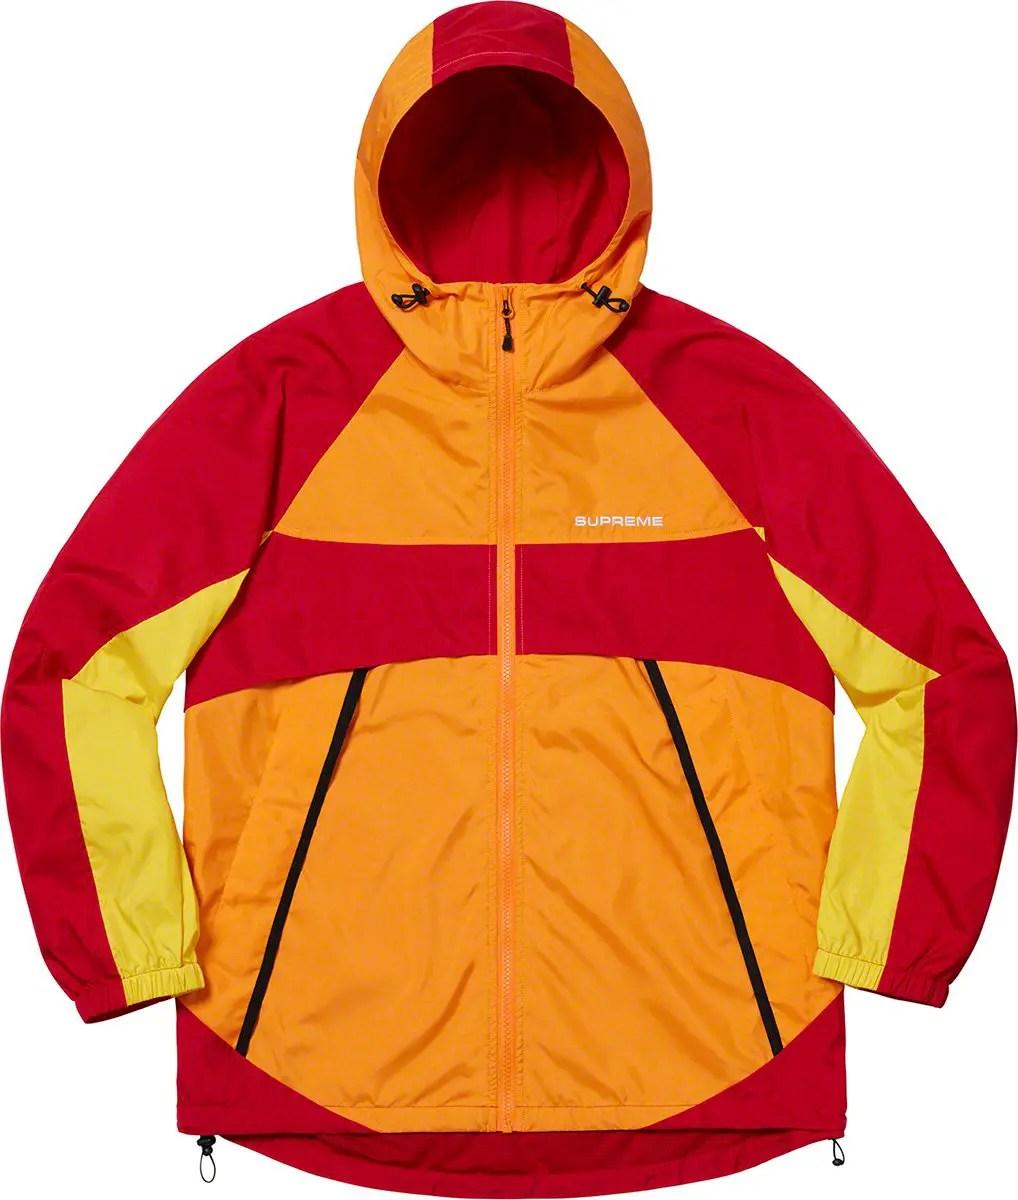 supreme-19ss-spring-summer-paneled-hooded-windbreaker-01